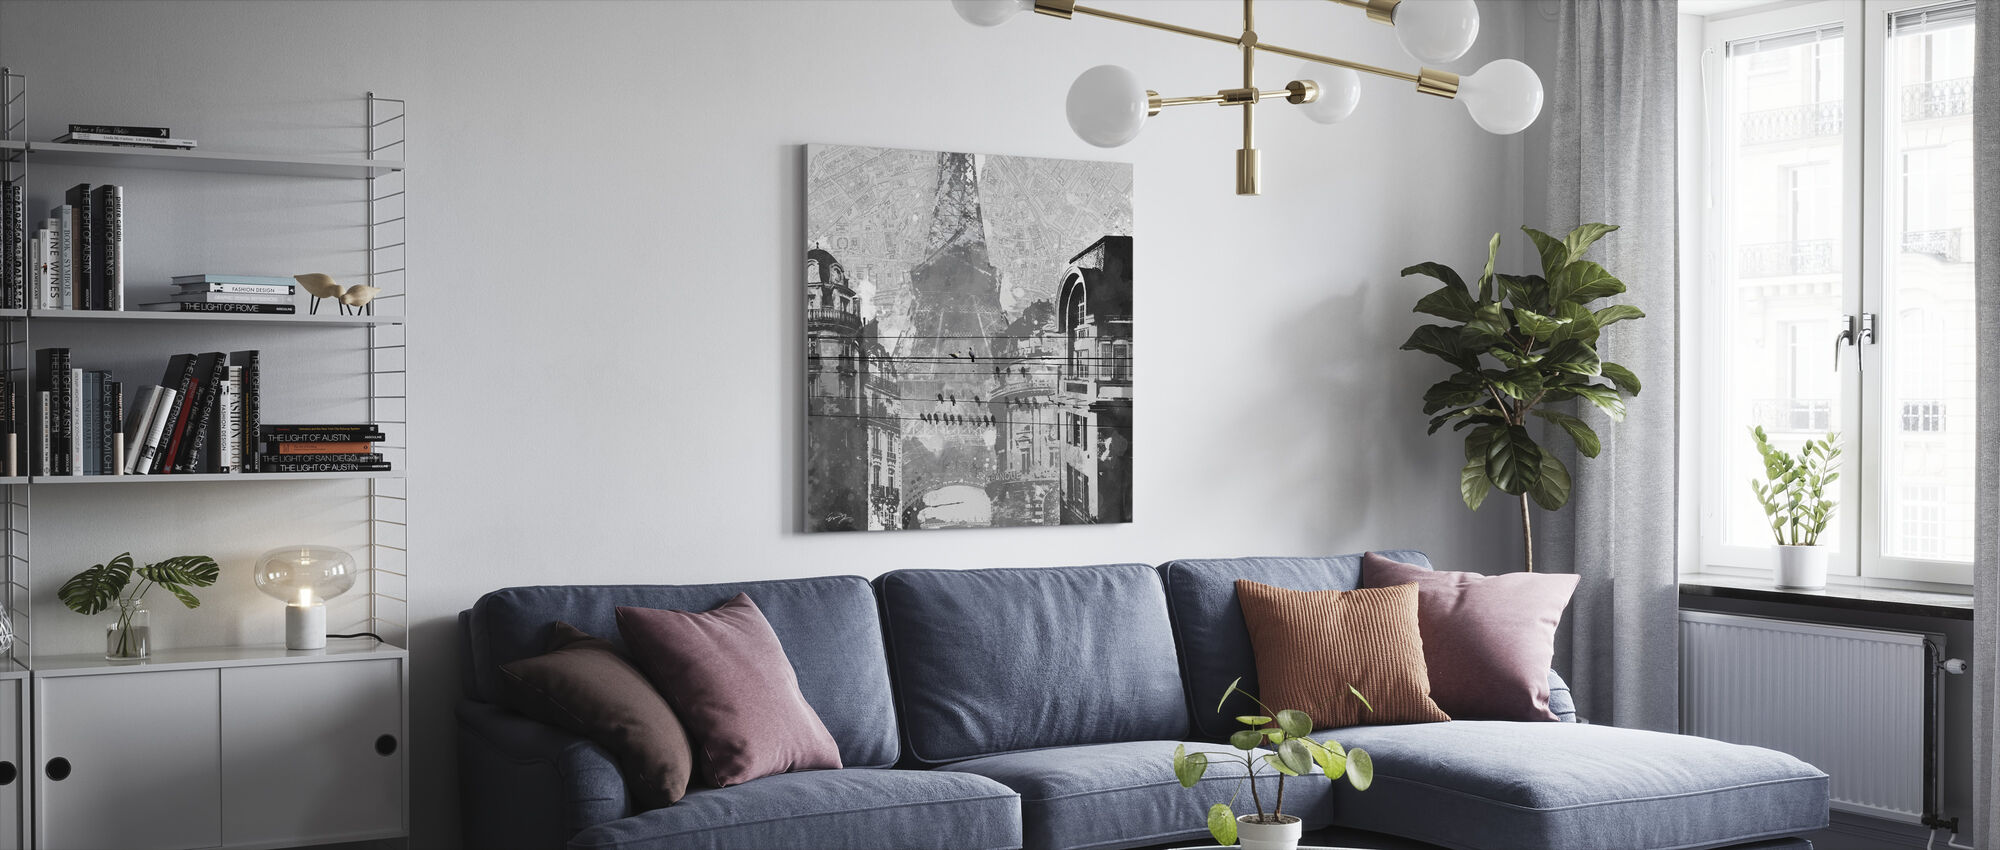 Pariisin linnut - Canvastaulu - Olohuone